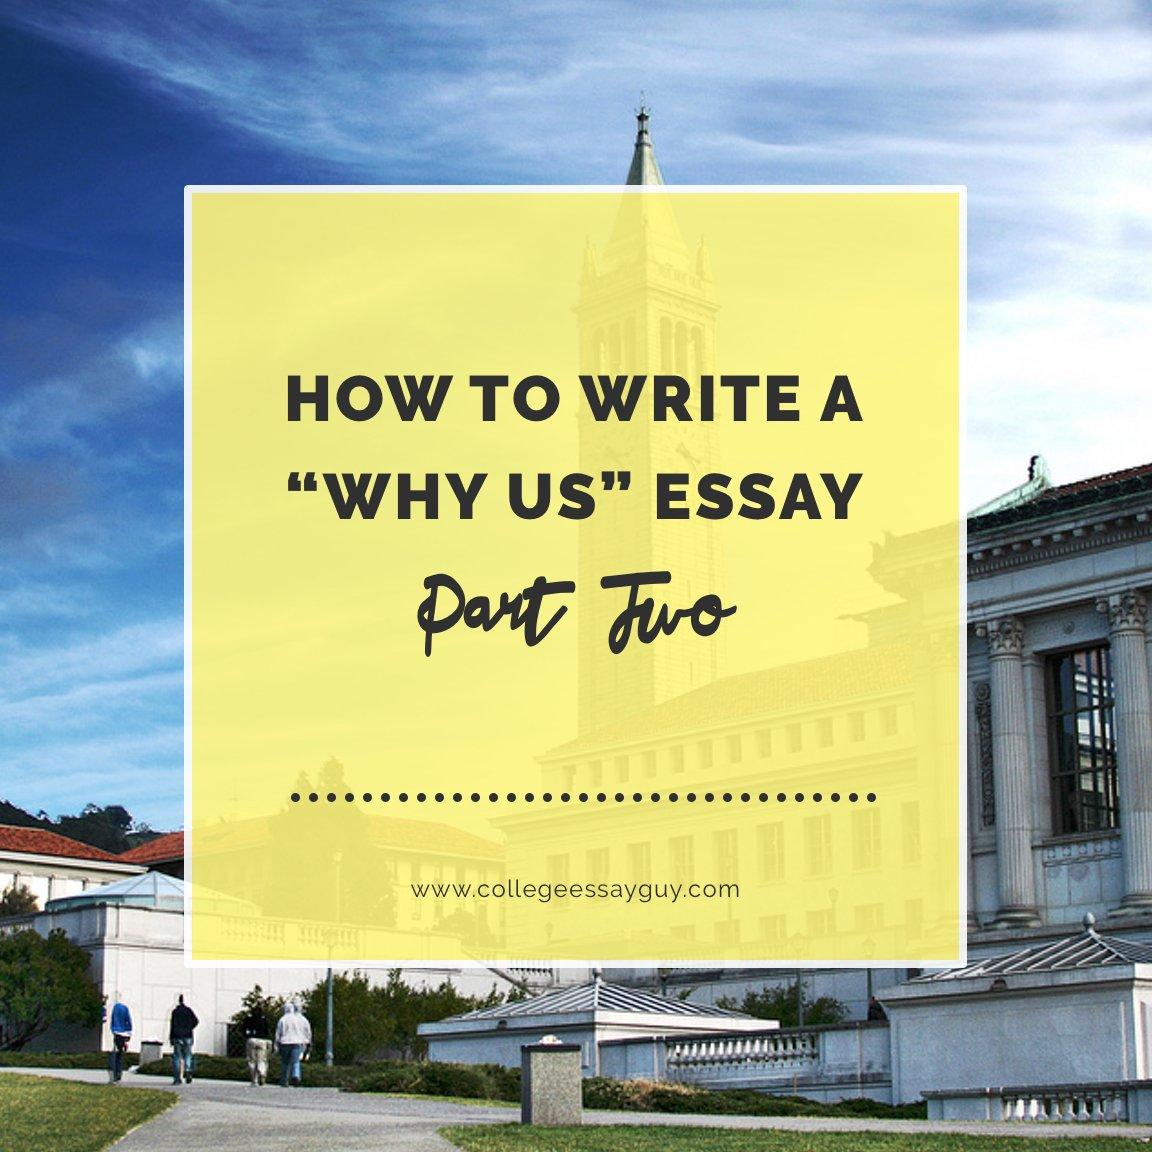 College essay helper guy why us